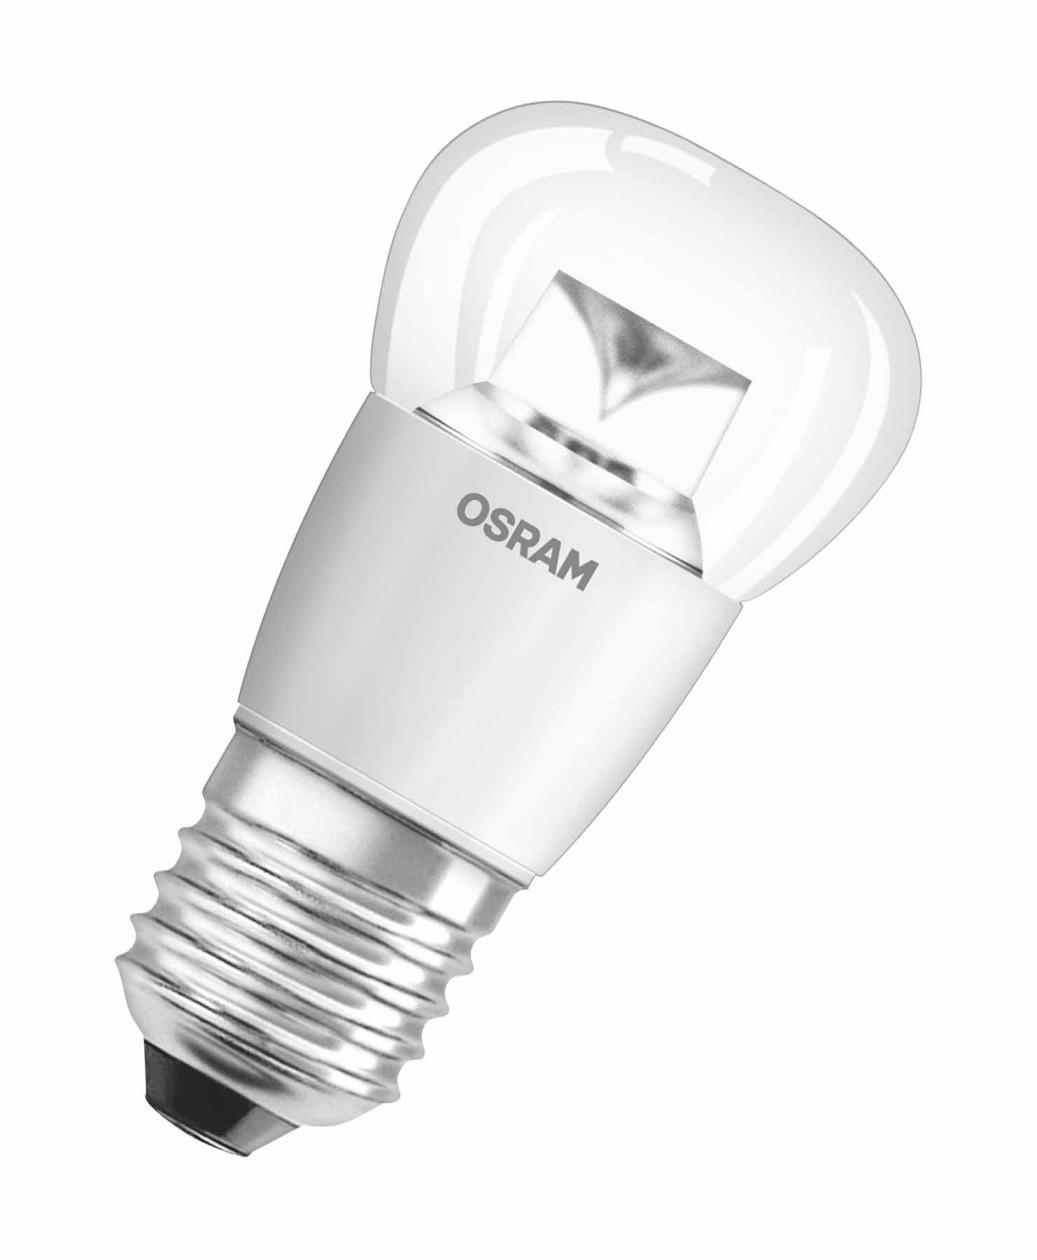 Светодиодная LED лампа OSRAM Star P40 Е27 6W, 470lm, 2700K, прозрачная колба, светодиодная